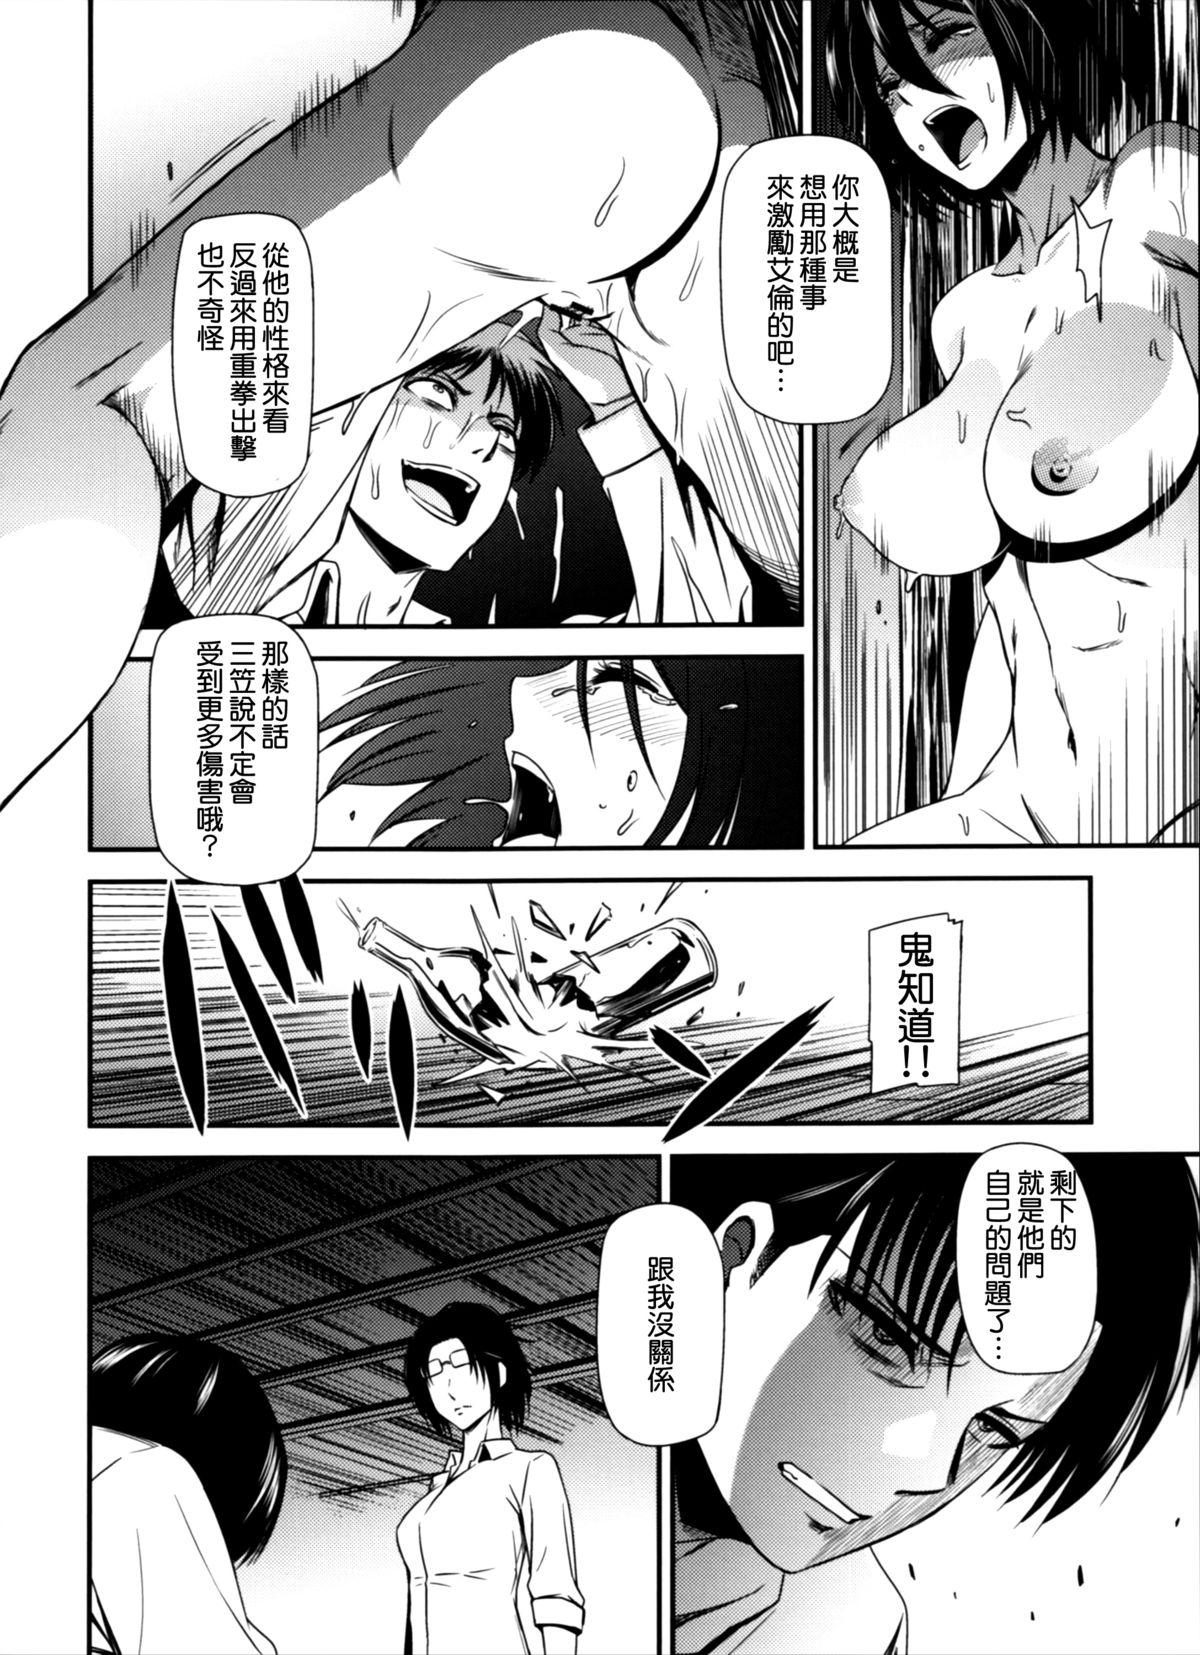 Gekishin Yon 26